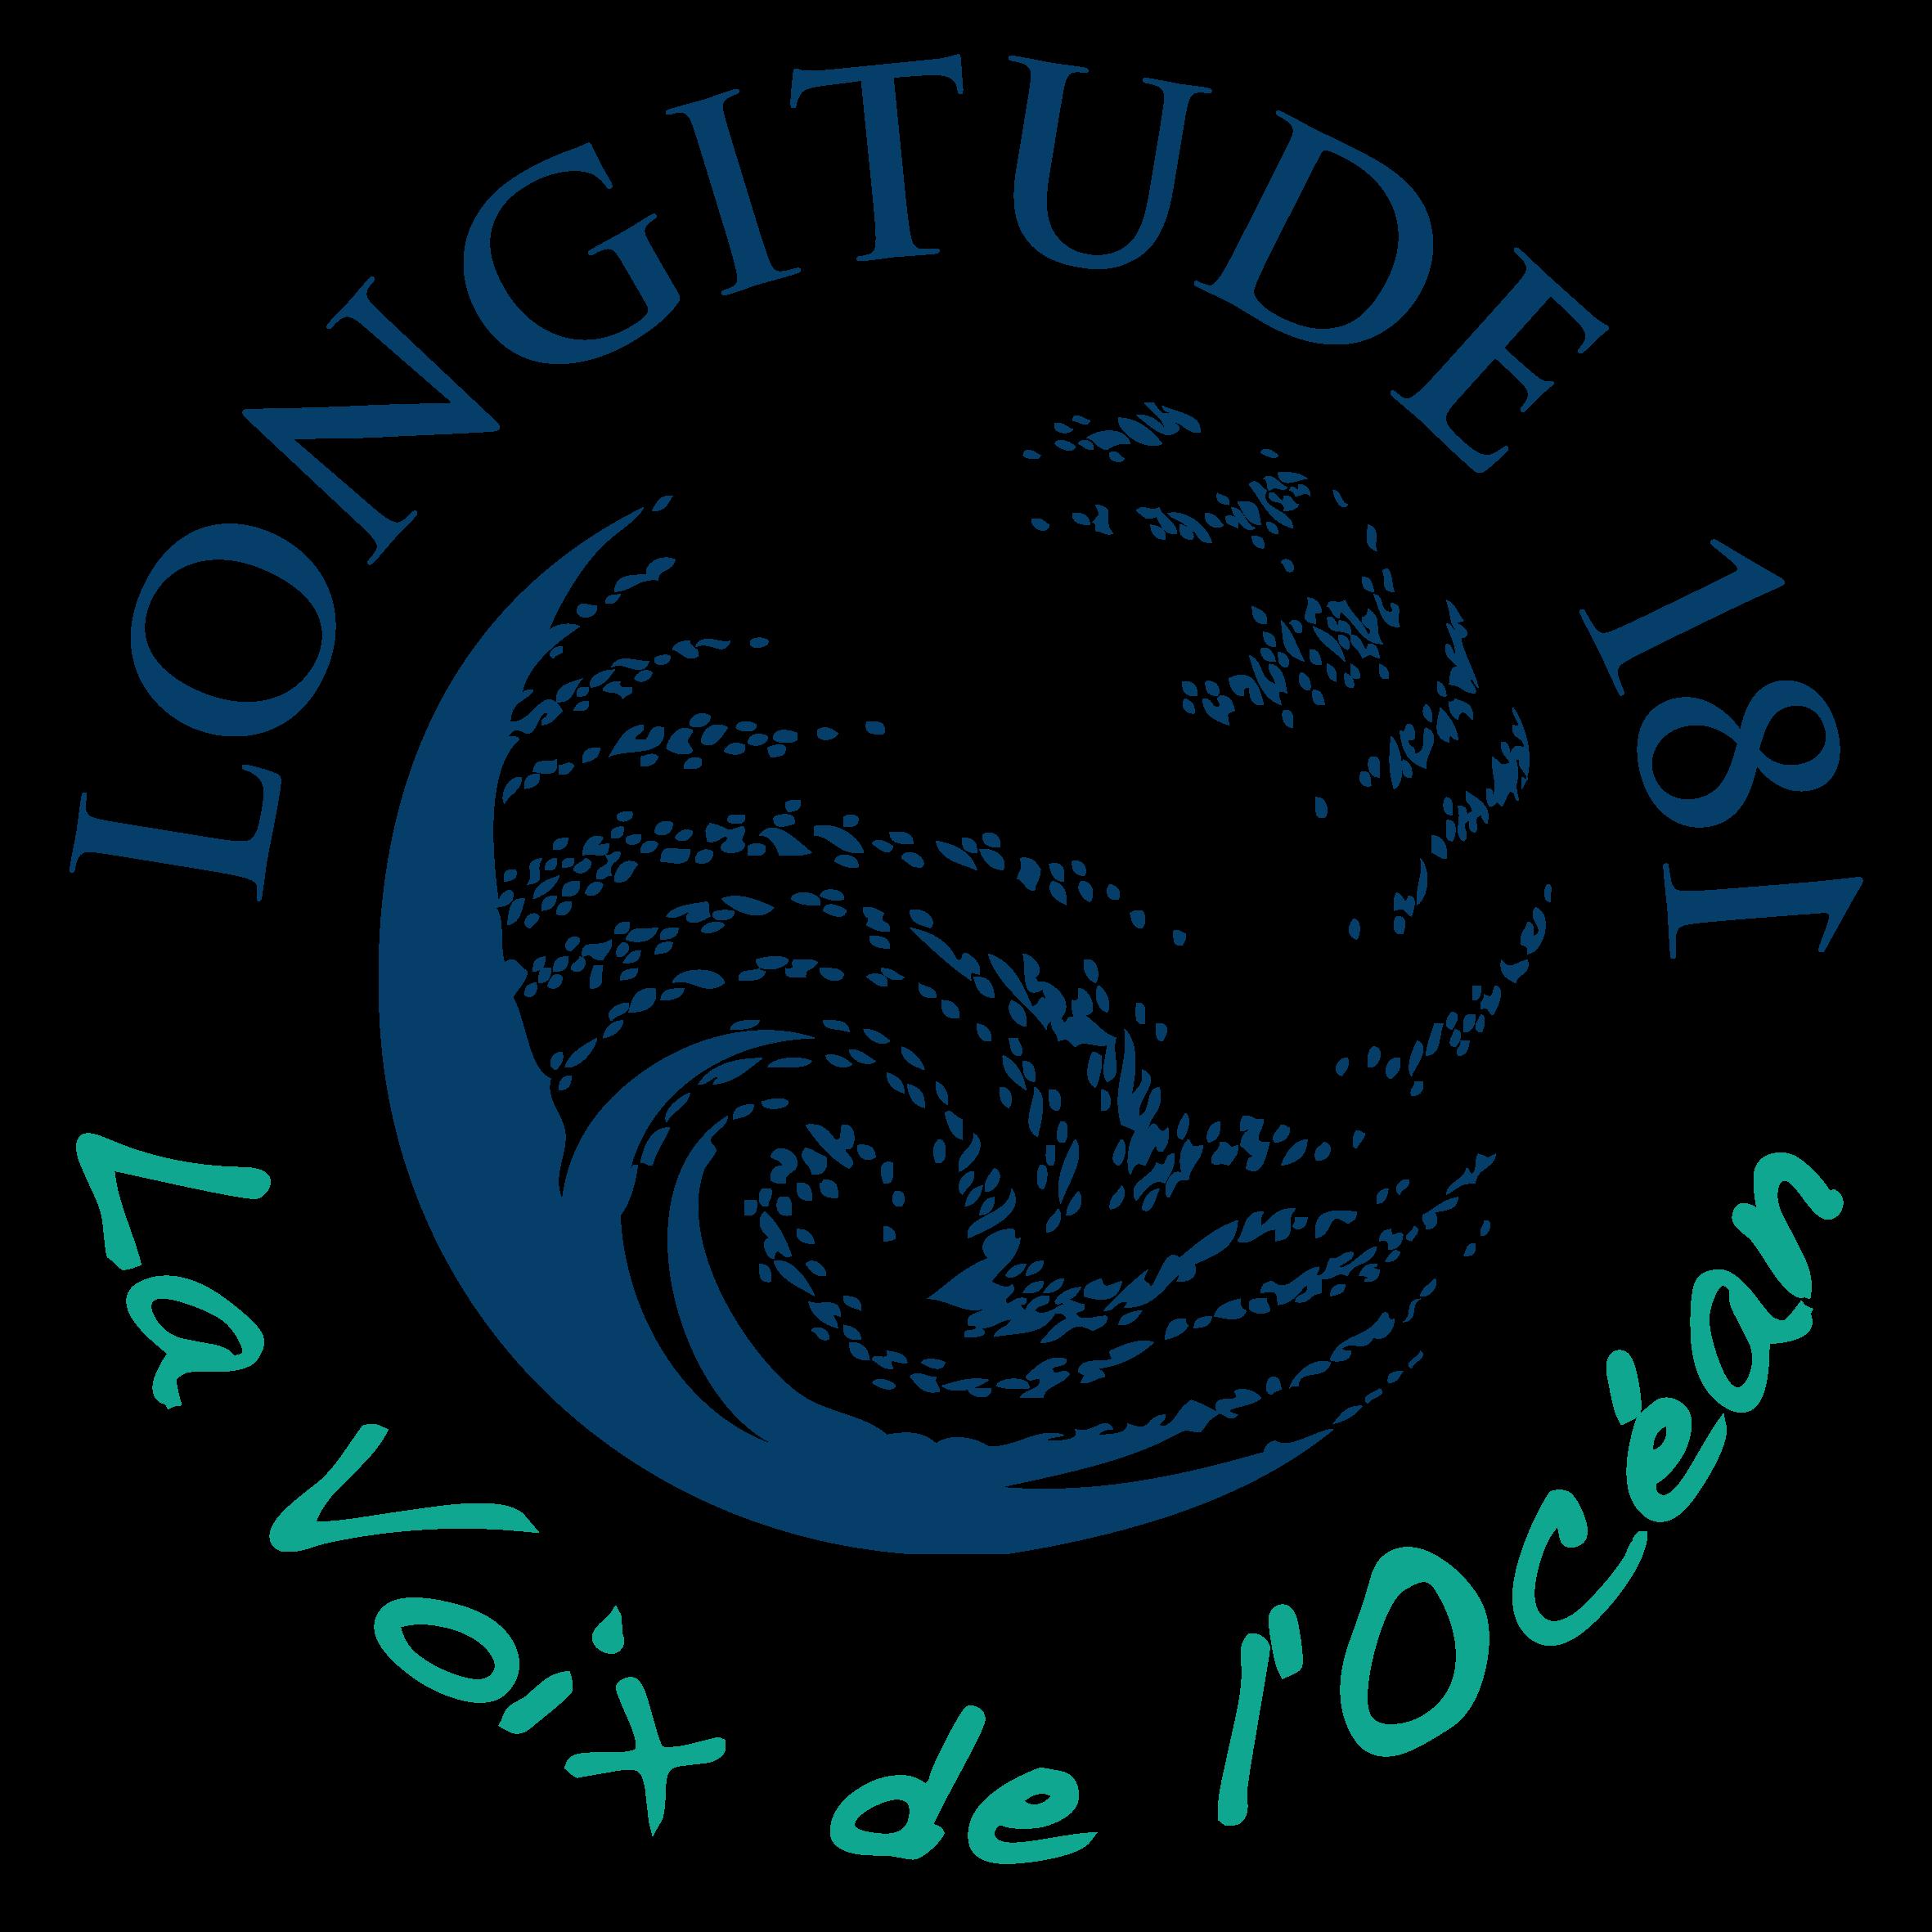 Association - LONGITUDE 181